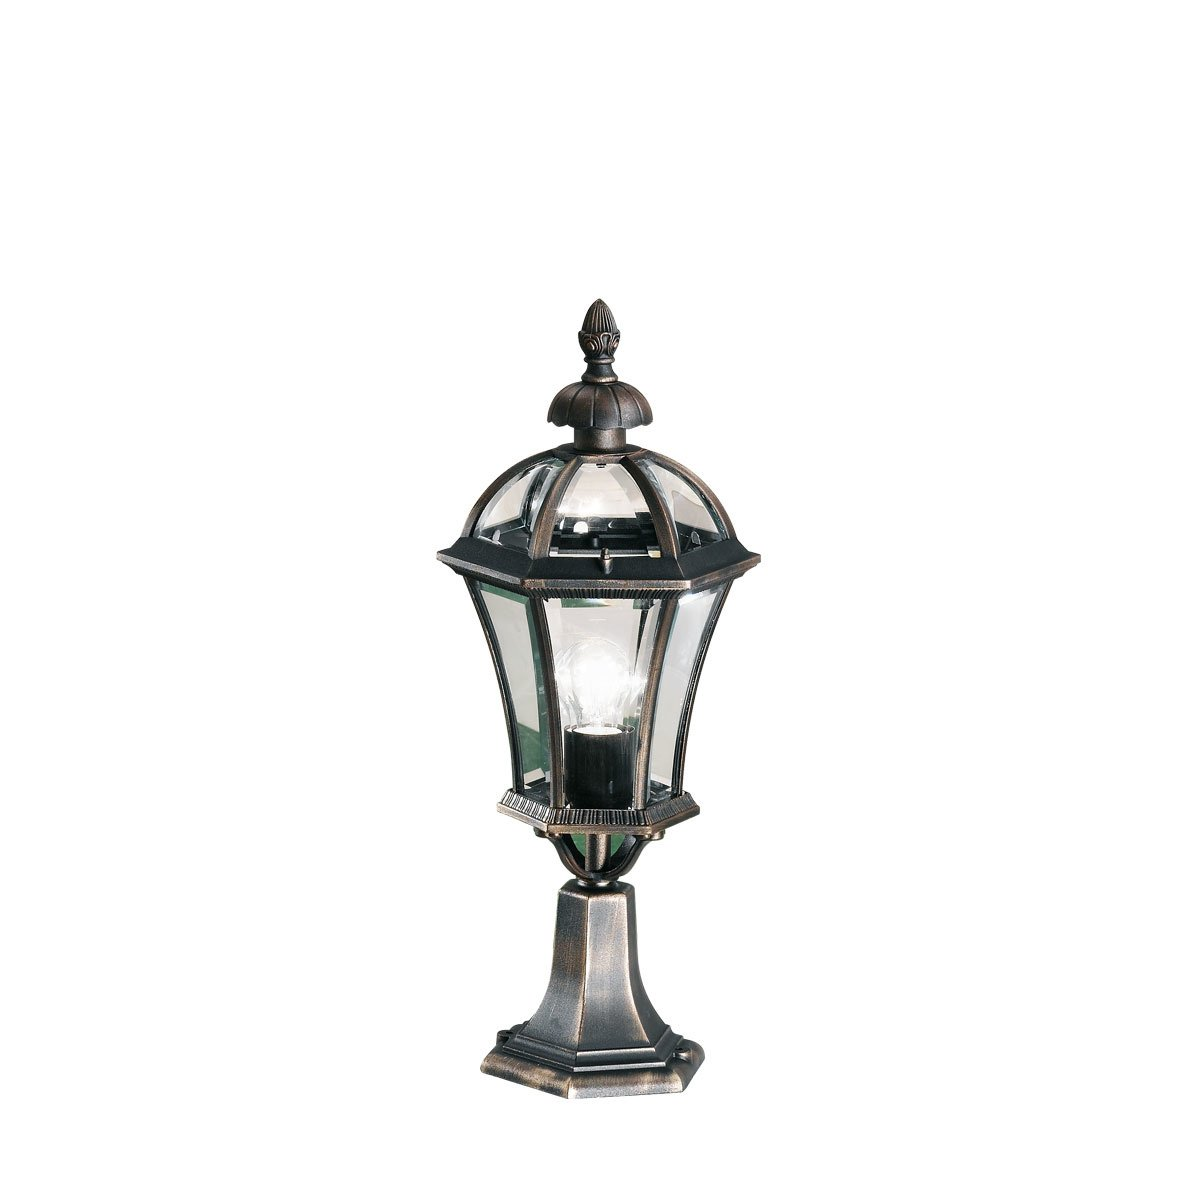 vendite calde Lanterna per per per 1 luci 65 cm Westminster  economico e di alta qualità